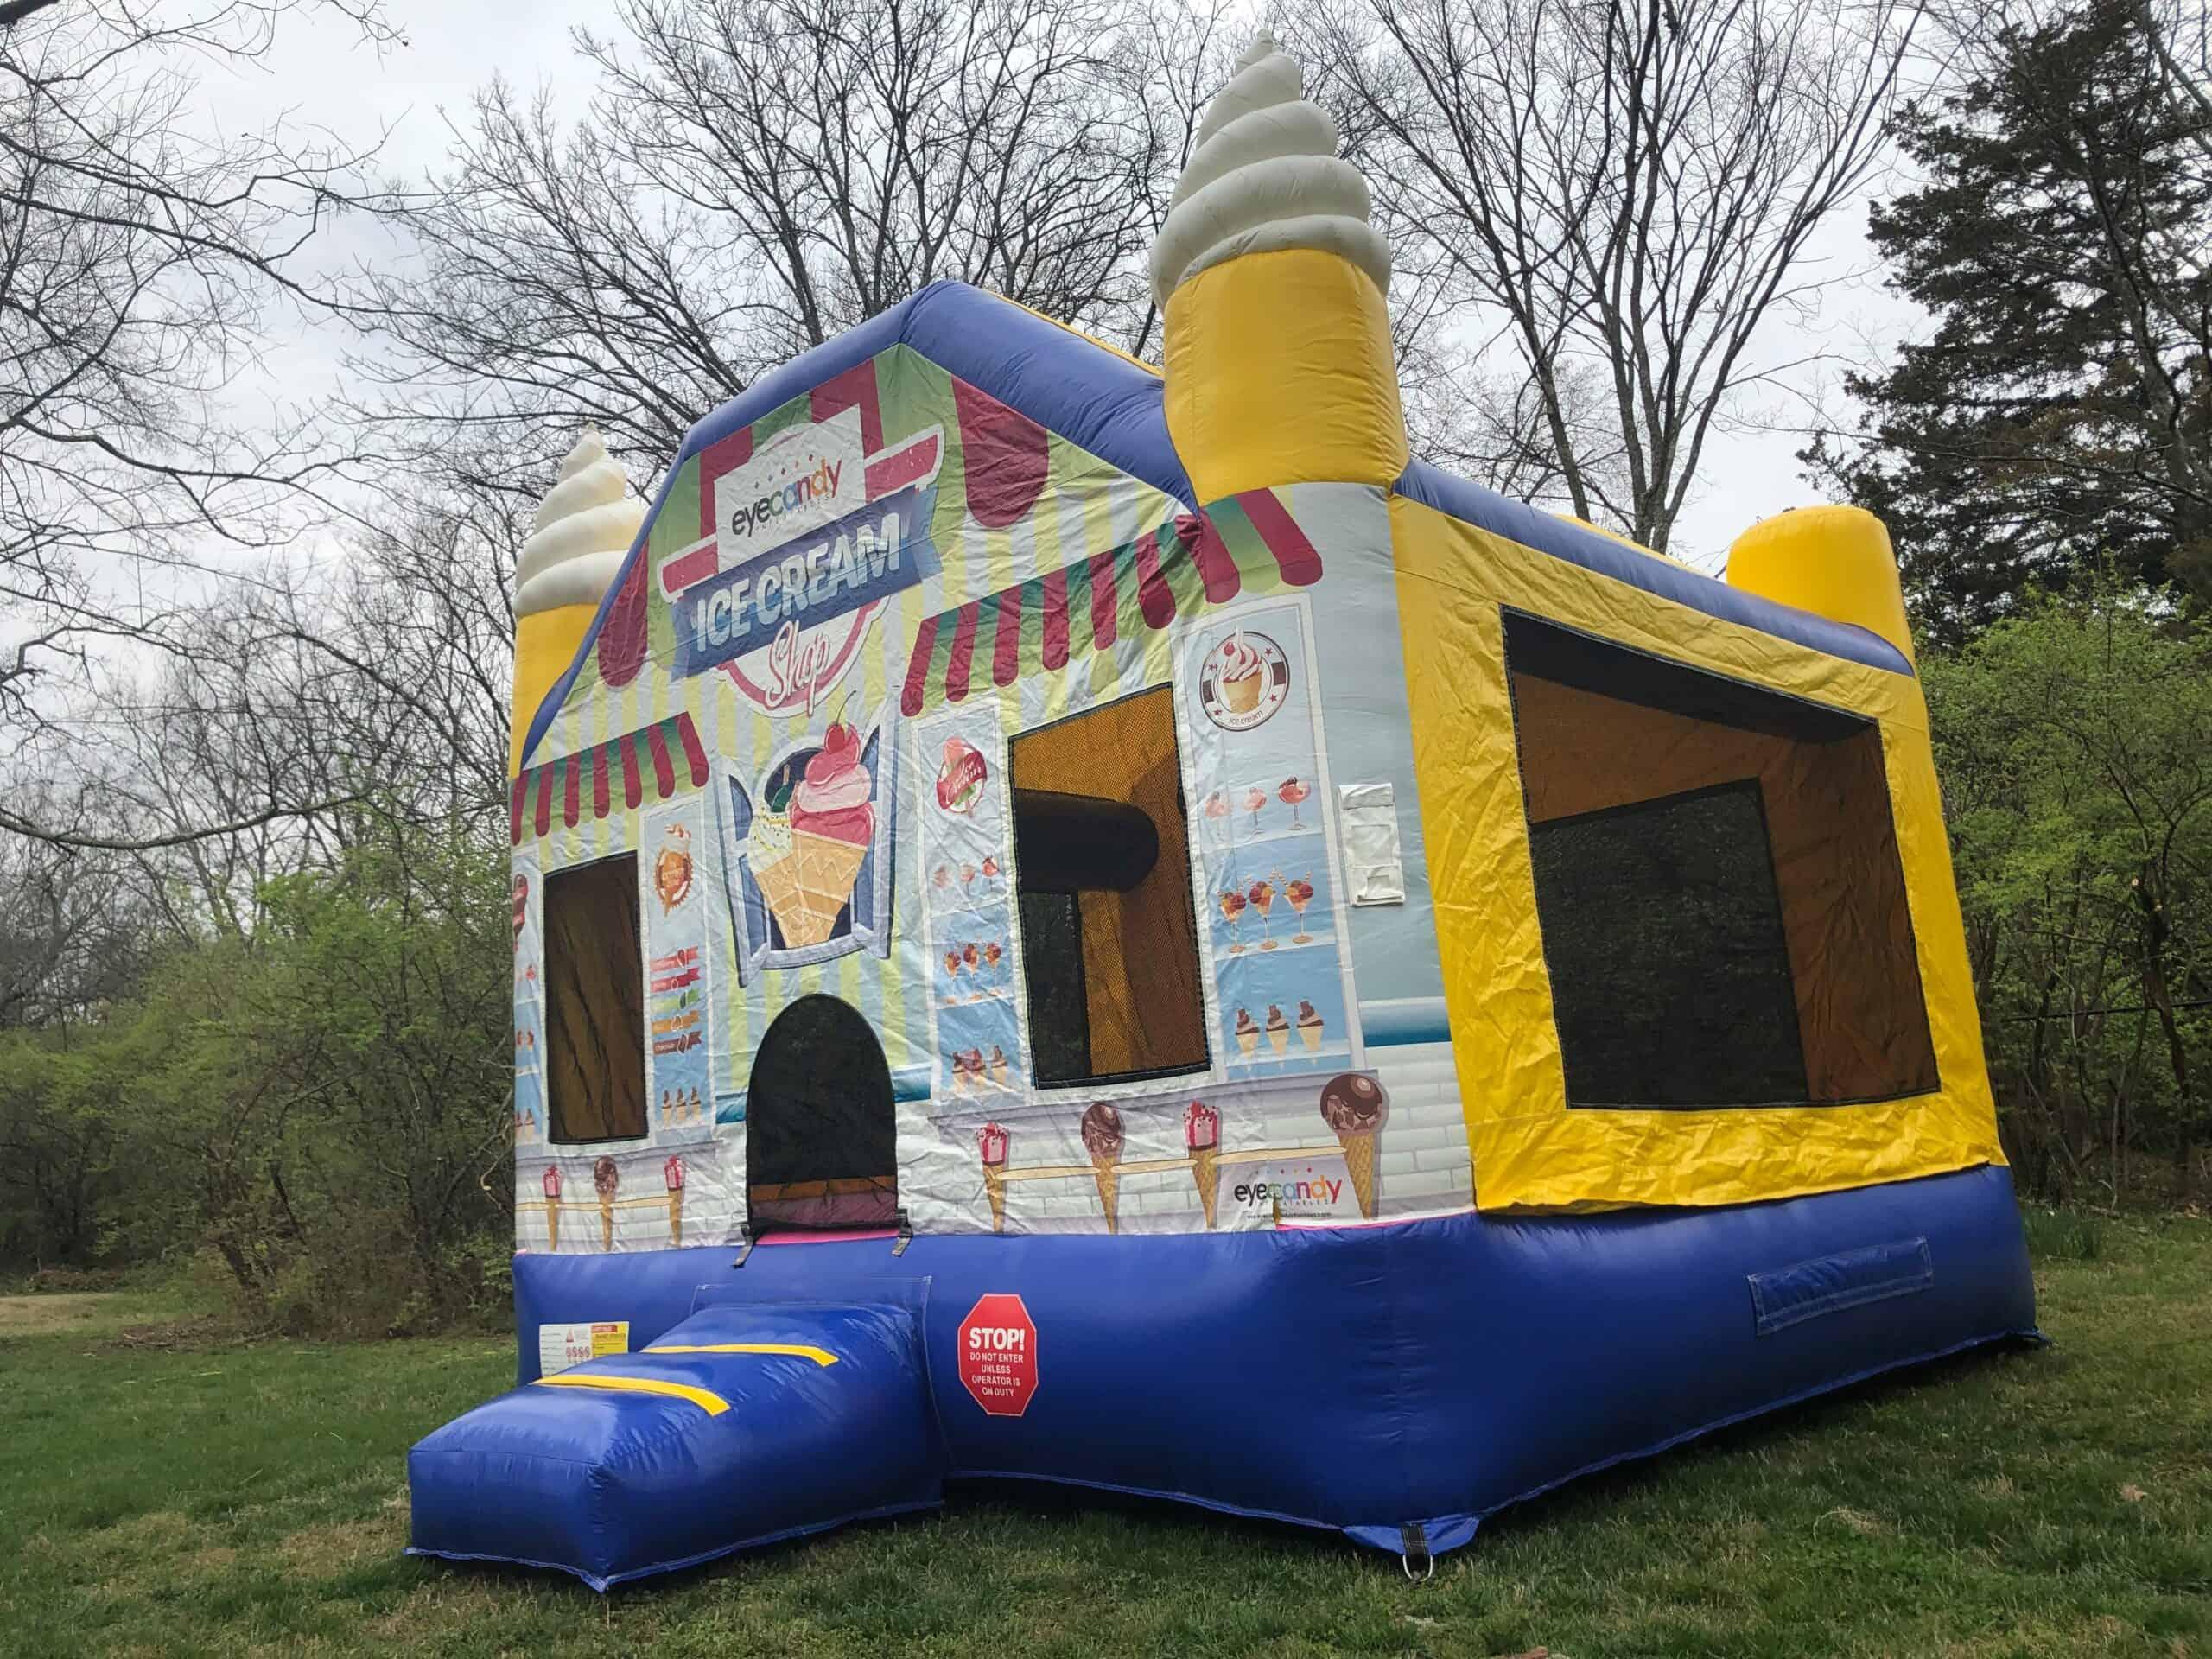 Ice Cream Shop Bounce House Rental in Nashville, TN 4